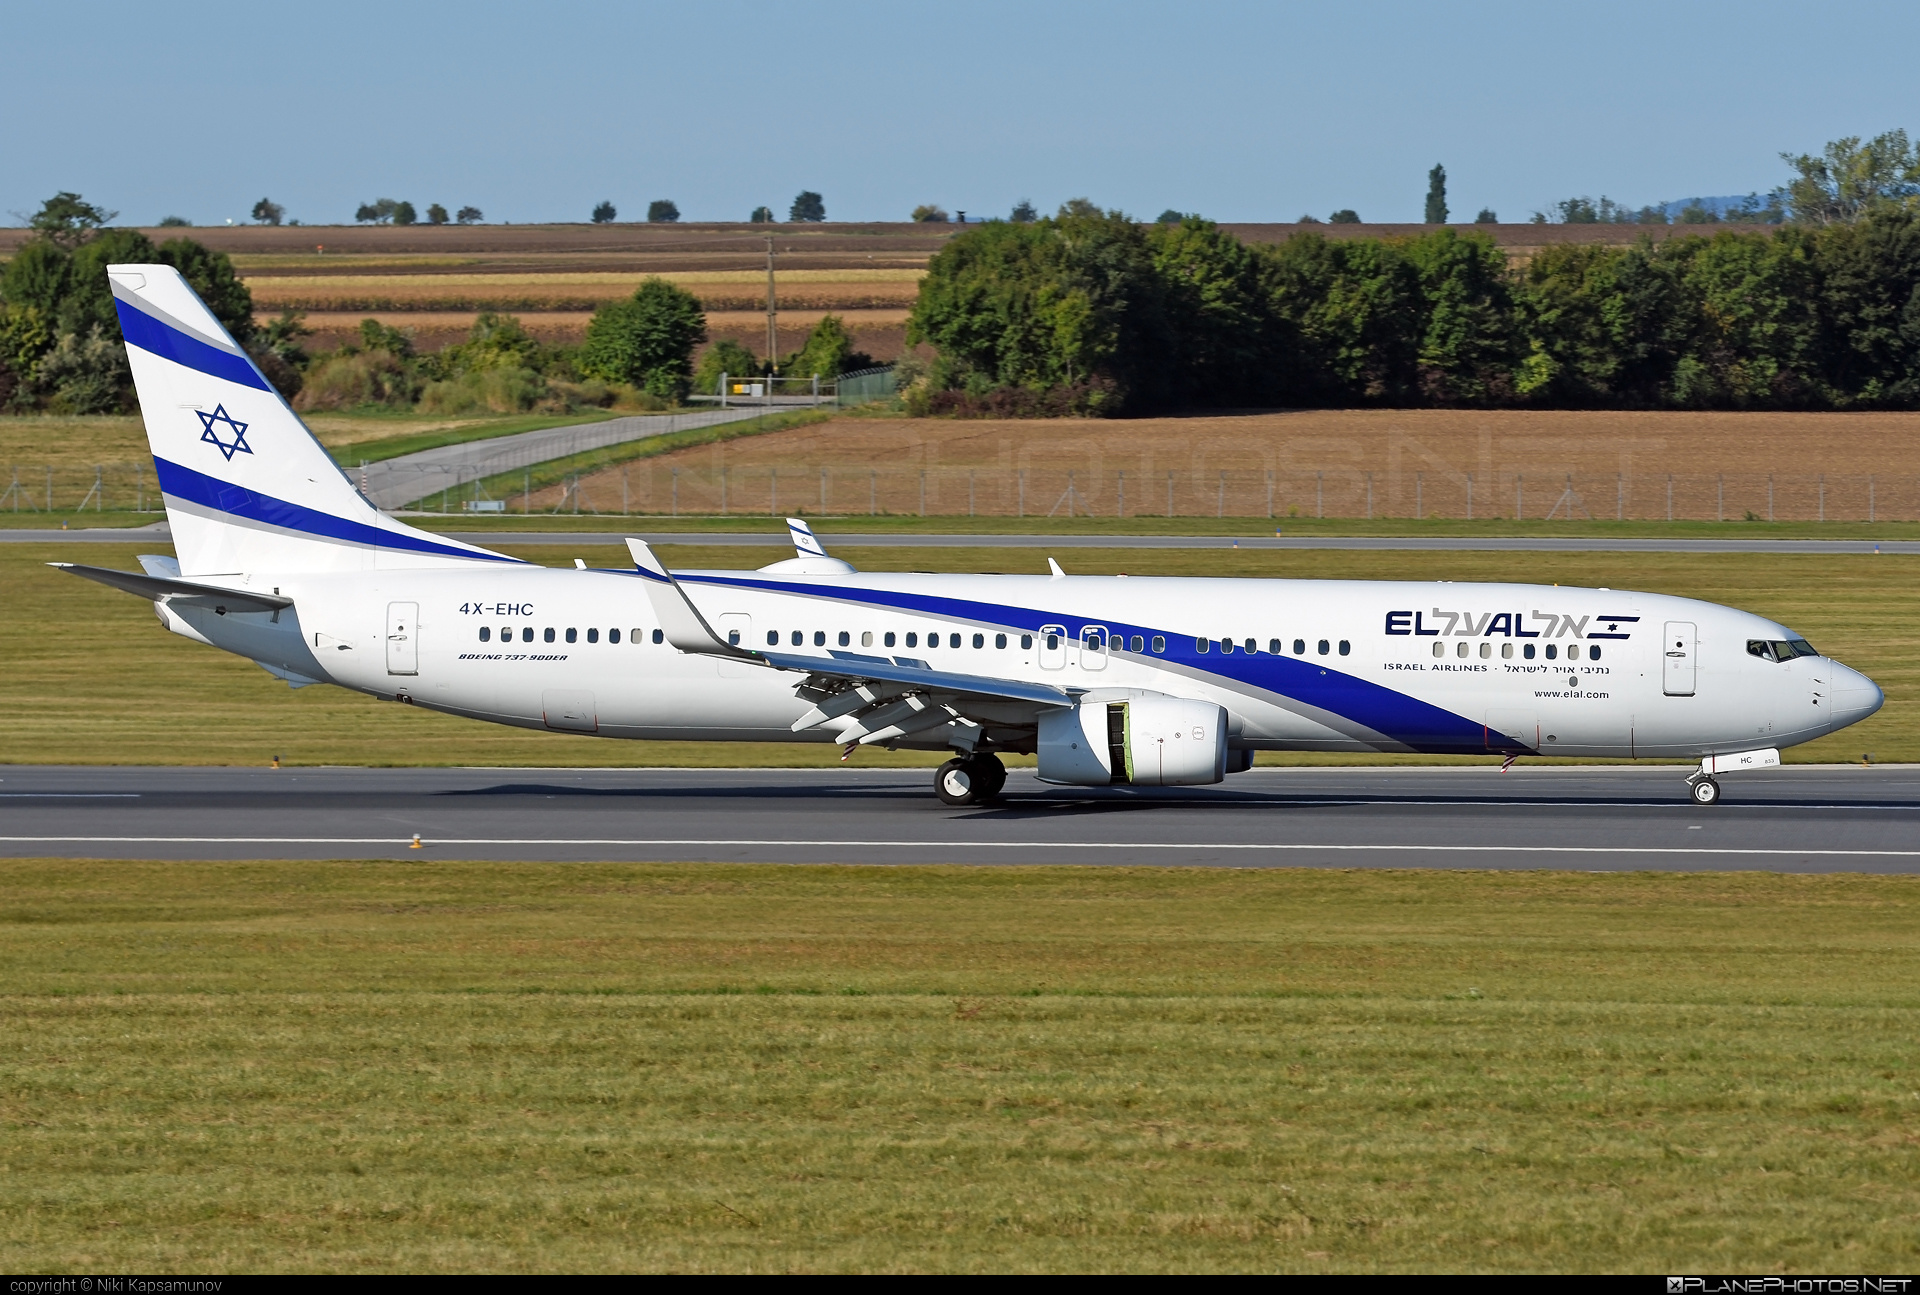 Boeing 737-900ER - 4X-EHC operated by El Al Israel Airlines #b737 #b737er #b737nextgen #b737ng #boeing #boeing737 #elal #elalisraelairlines #israelairlines